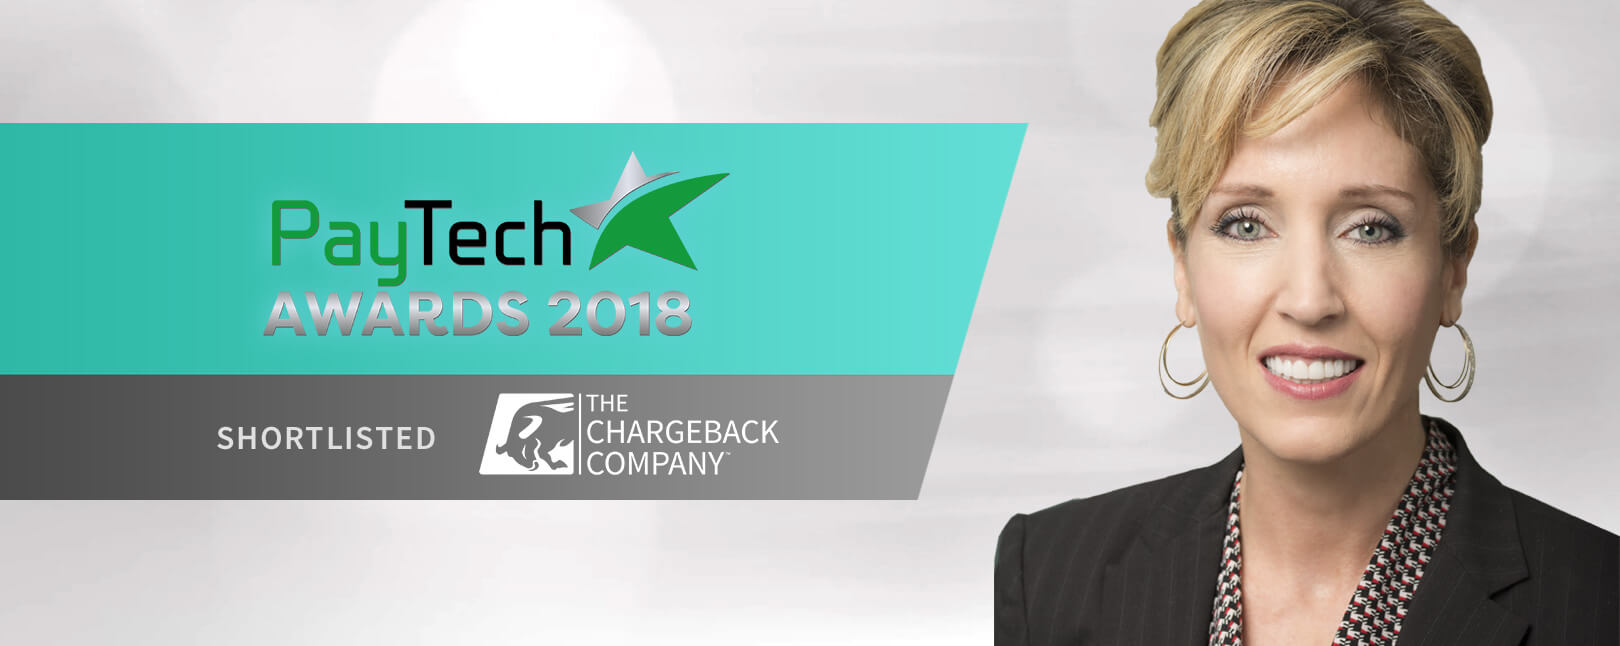 Monica Eaton-Cardone a Finalist for Woman in PayTech Award 2018